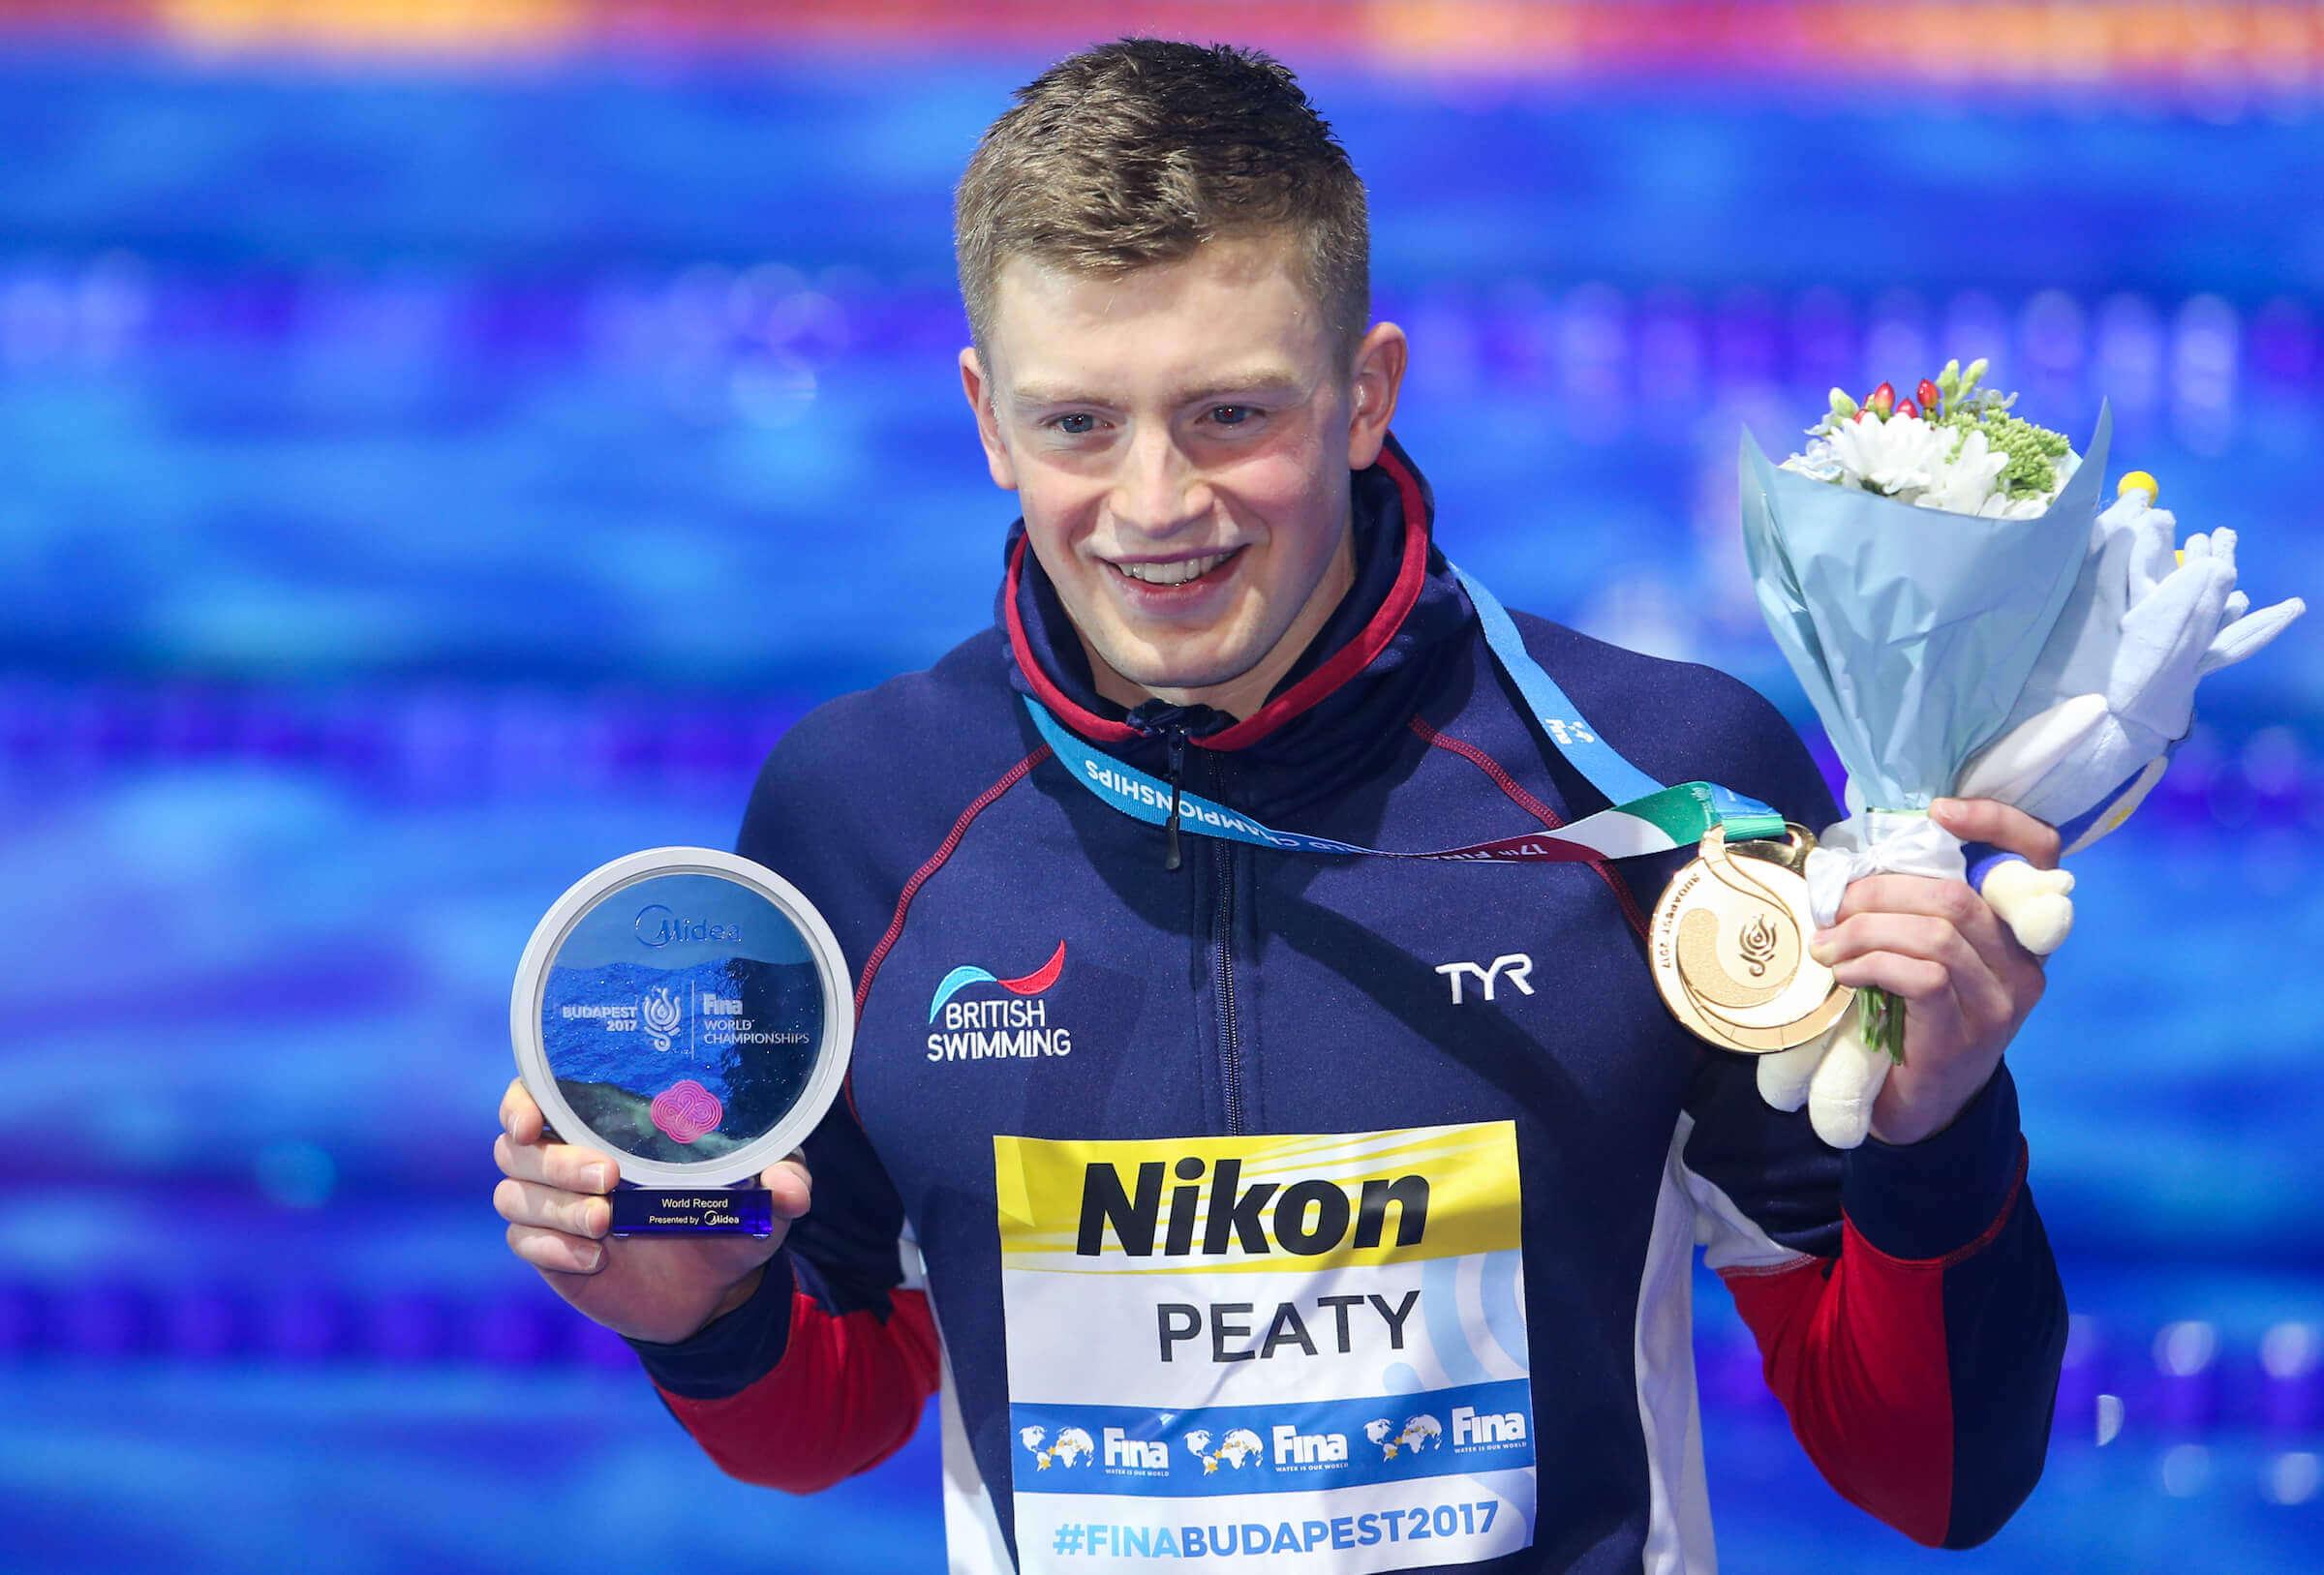 adam-peaty-medal-2017-world-champs